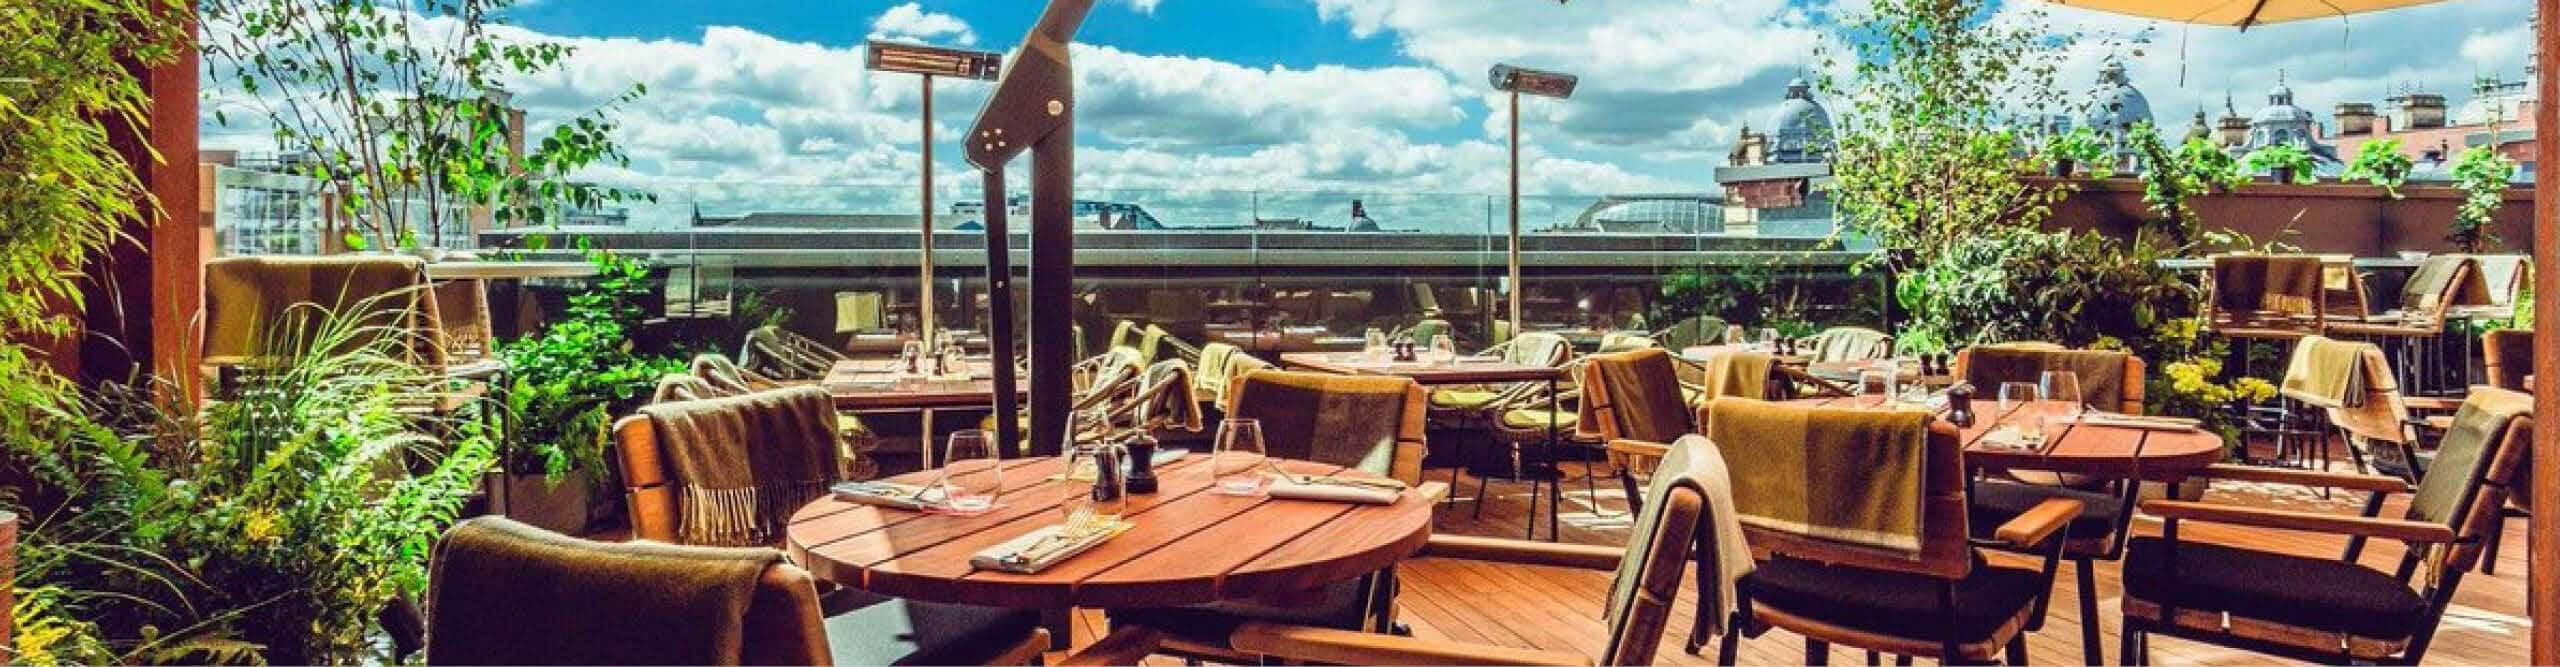 East 59th and Issho Leeds Restaurants